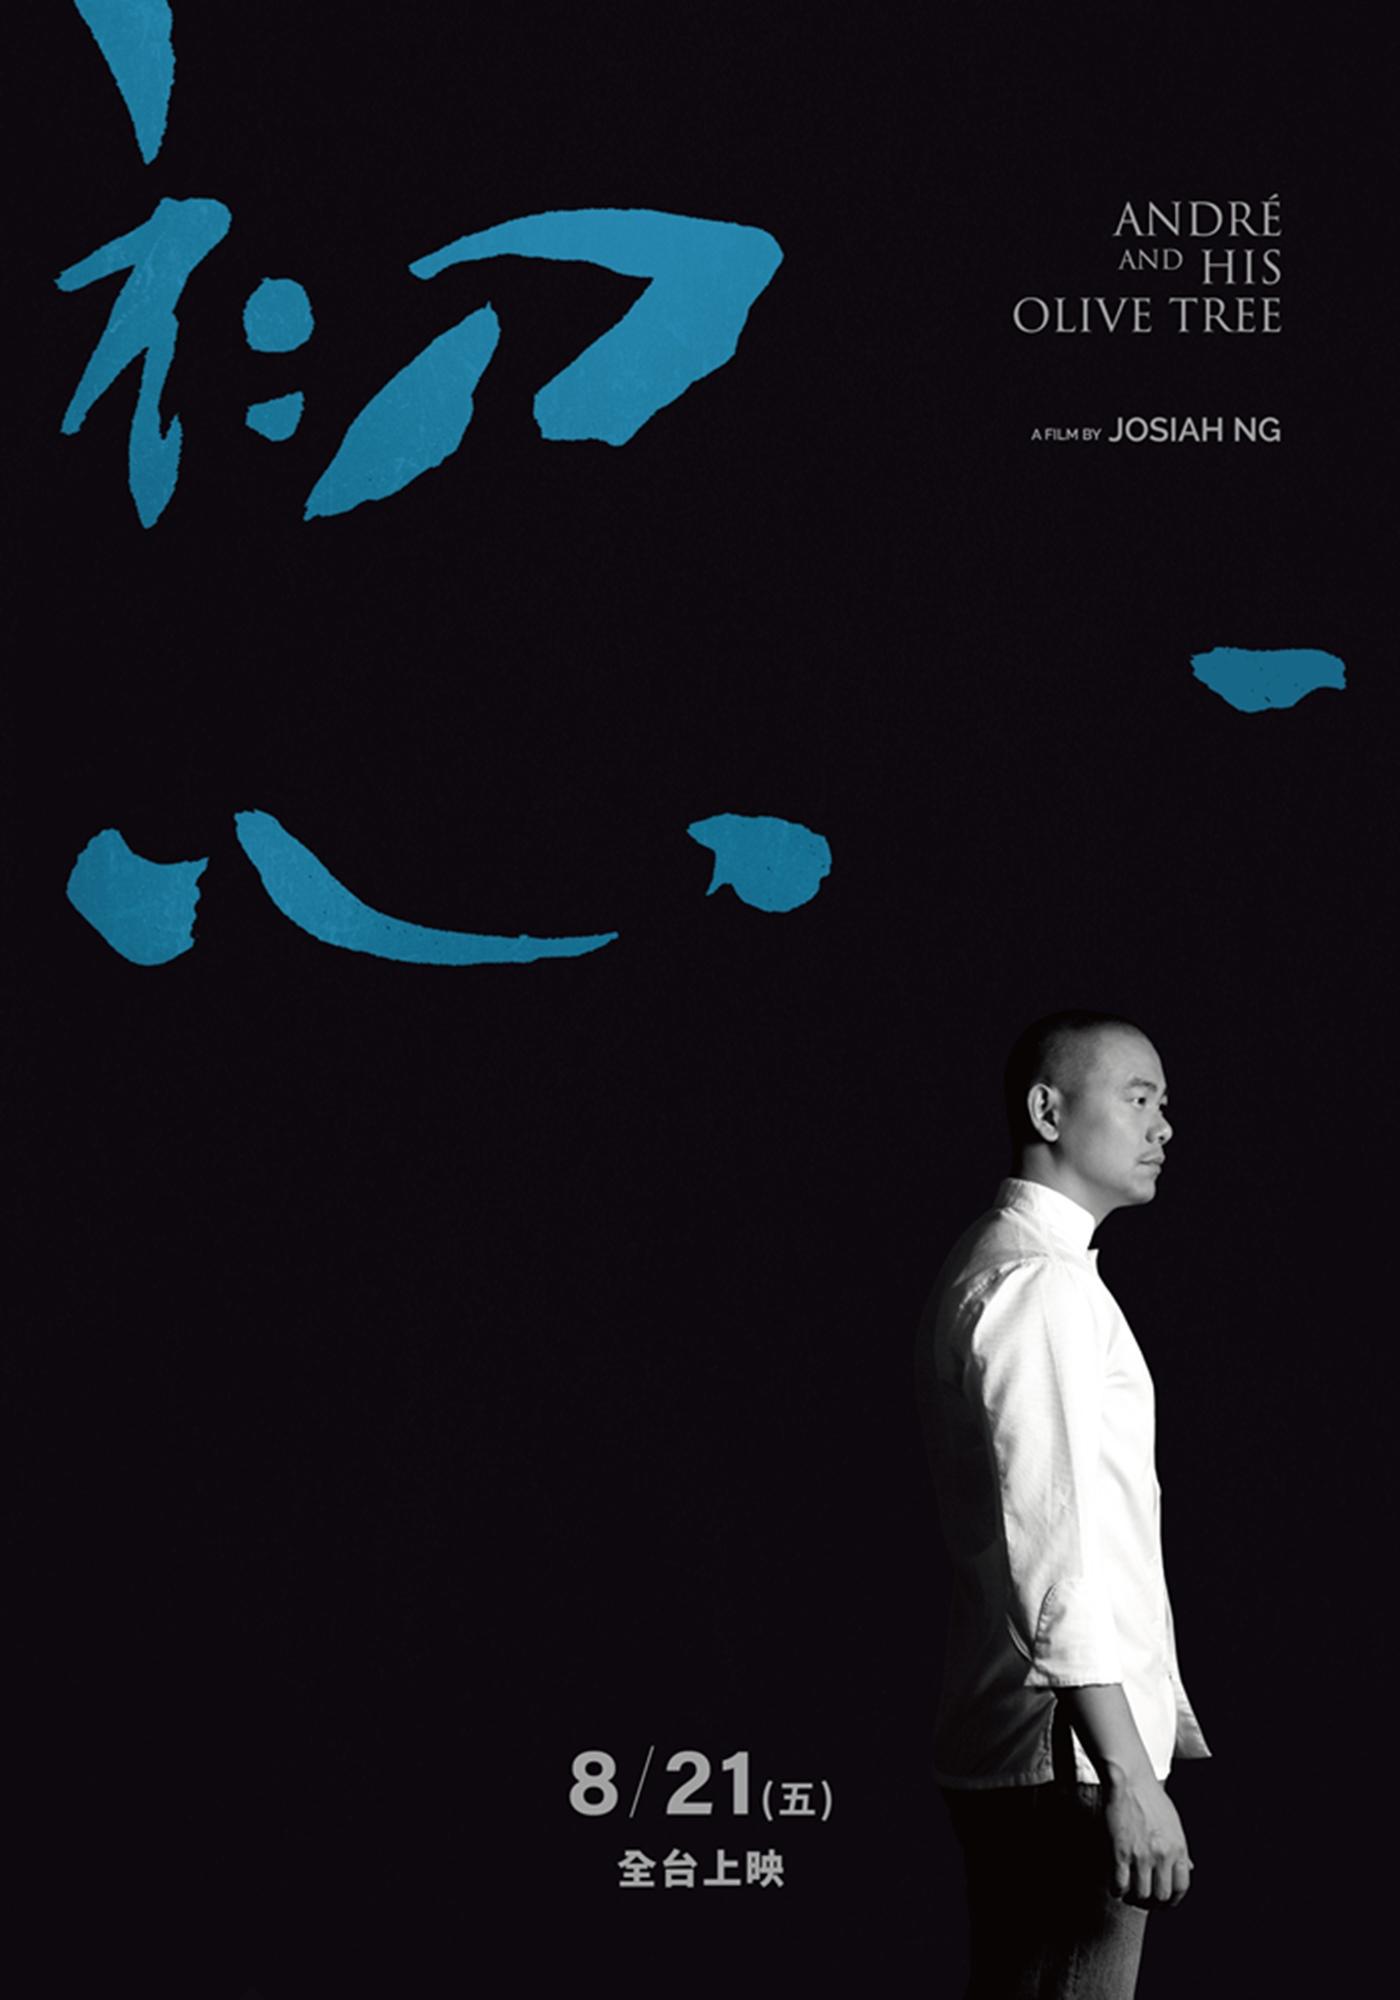 【電影】初心André & his olive tree @貝大小姐與瑞餚姐の囂脂私蜜話